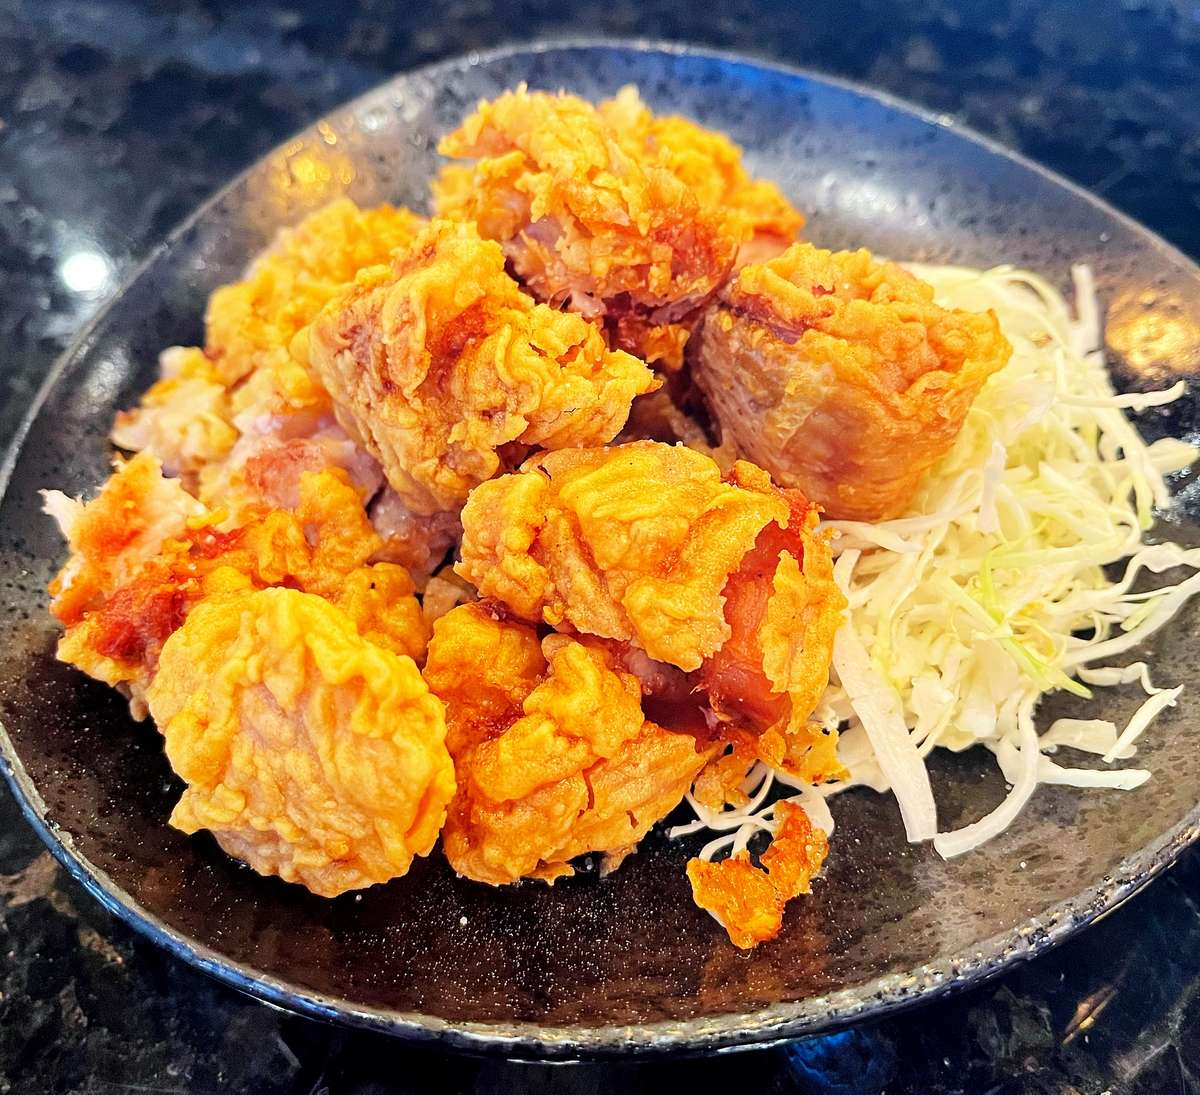 Boneless Fried Chicken Drumsticks (無骨雞腿排)